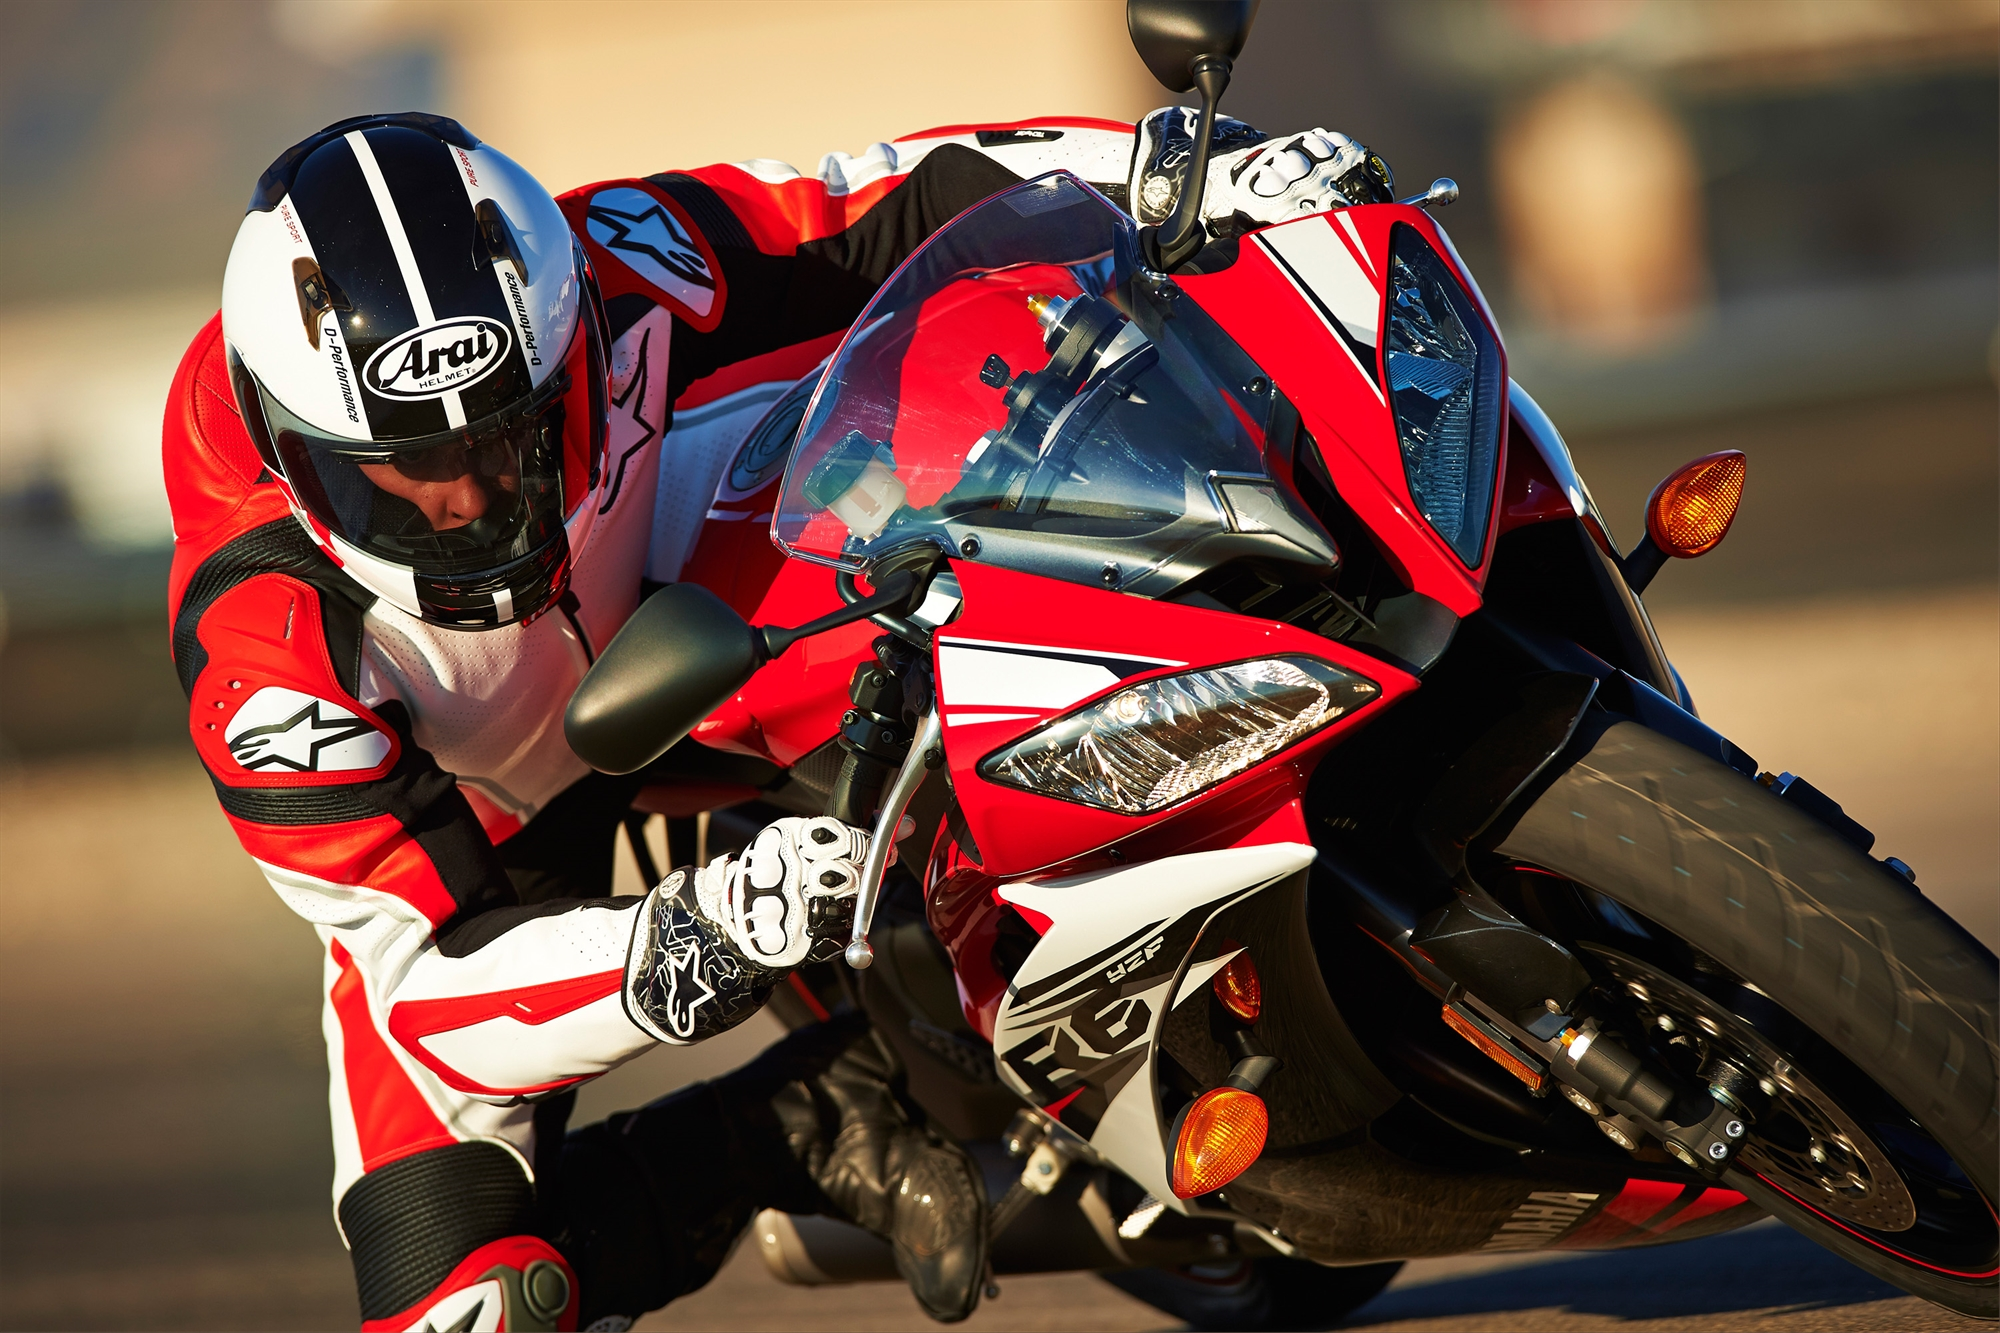 2014 Yamaha YZF-R6 Official Pics - autoevolution